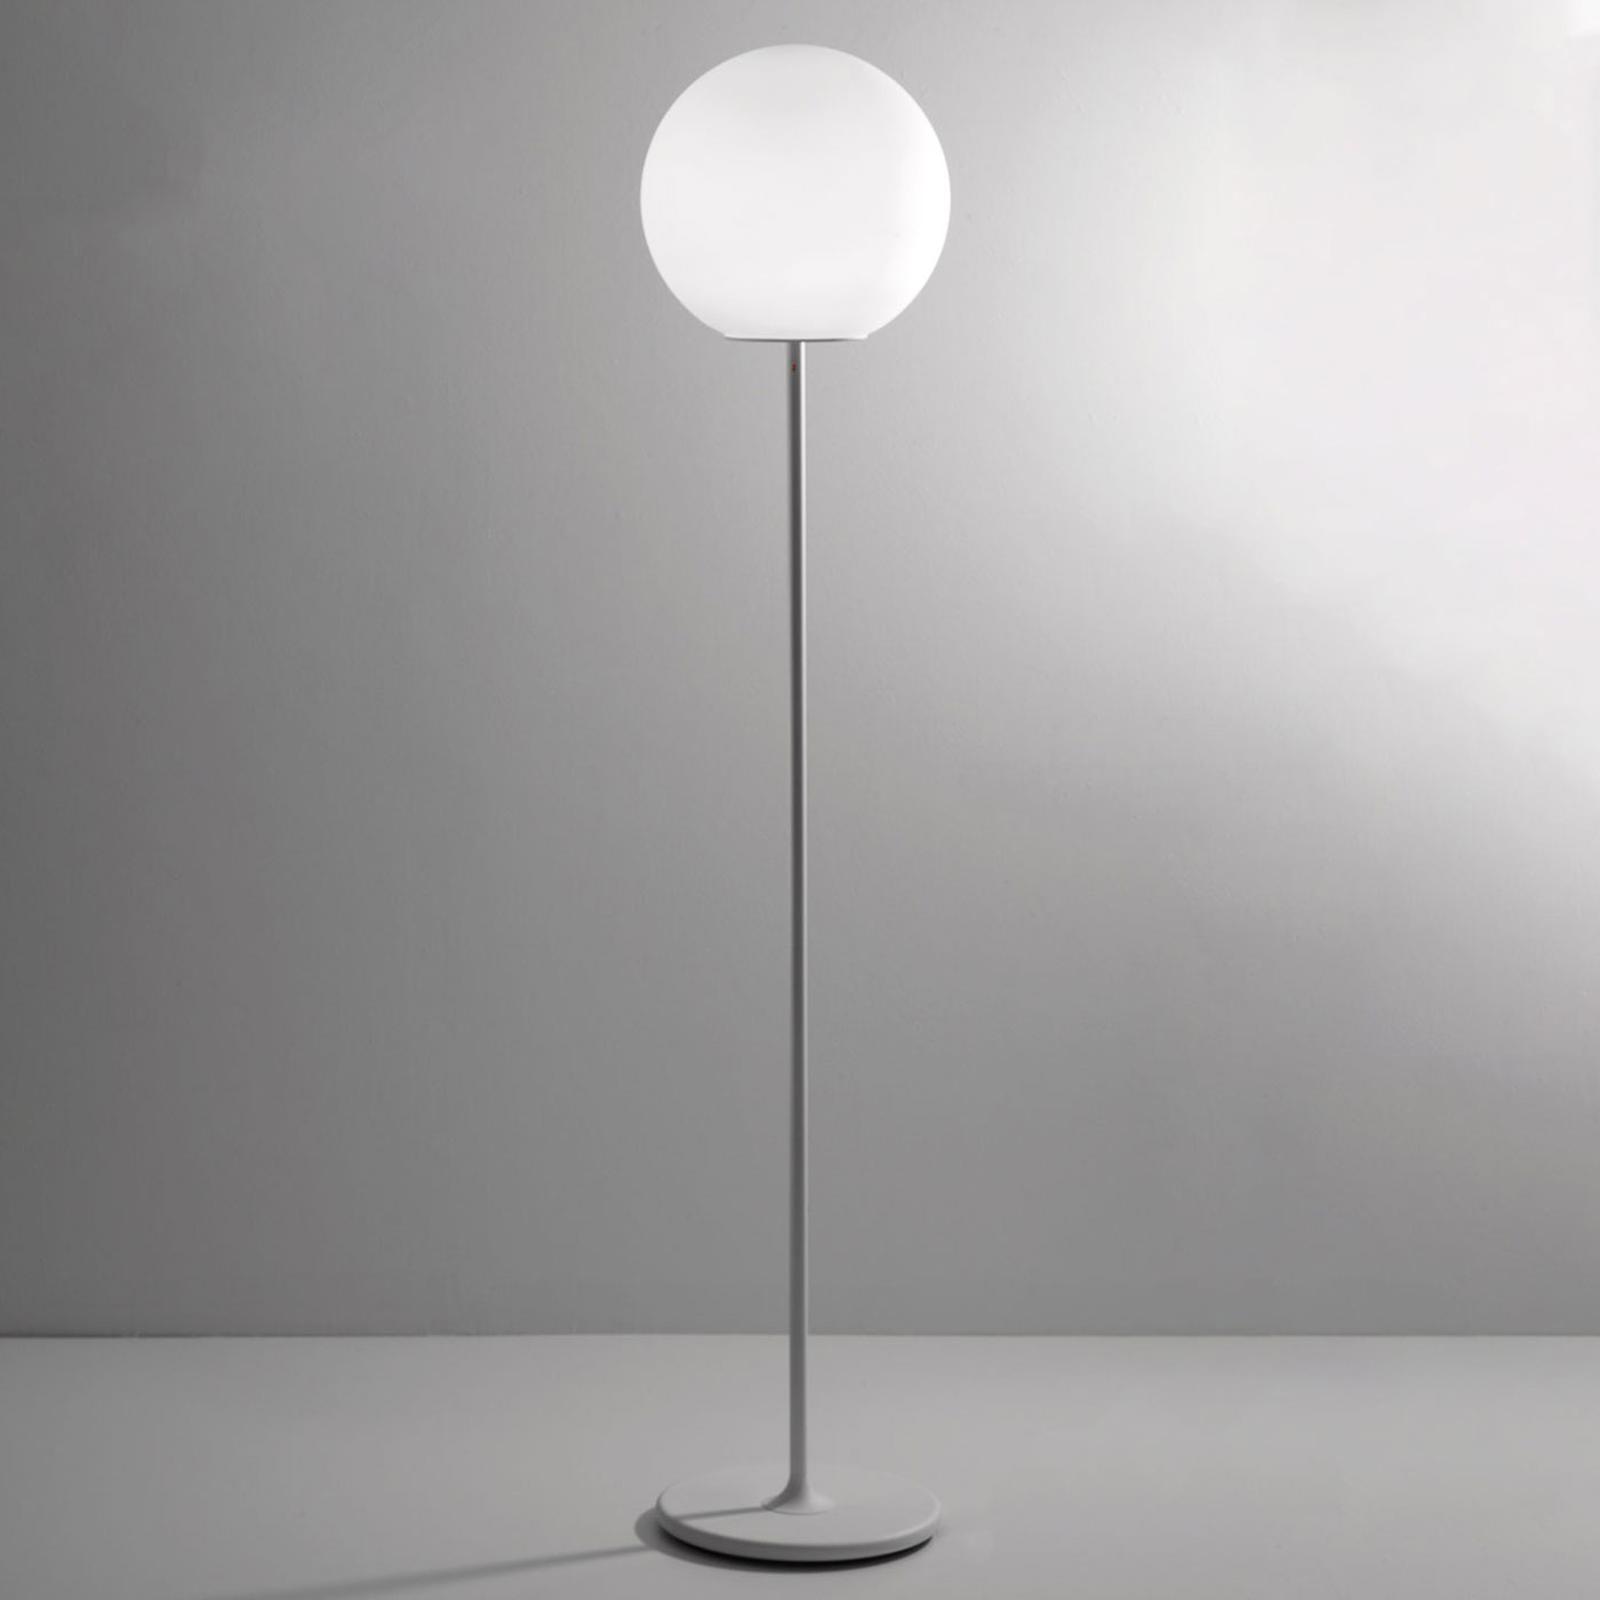 Fabbian Lumi Sfera glas-vloerlamp, Ø 40 cm